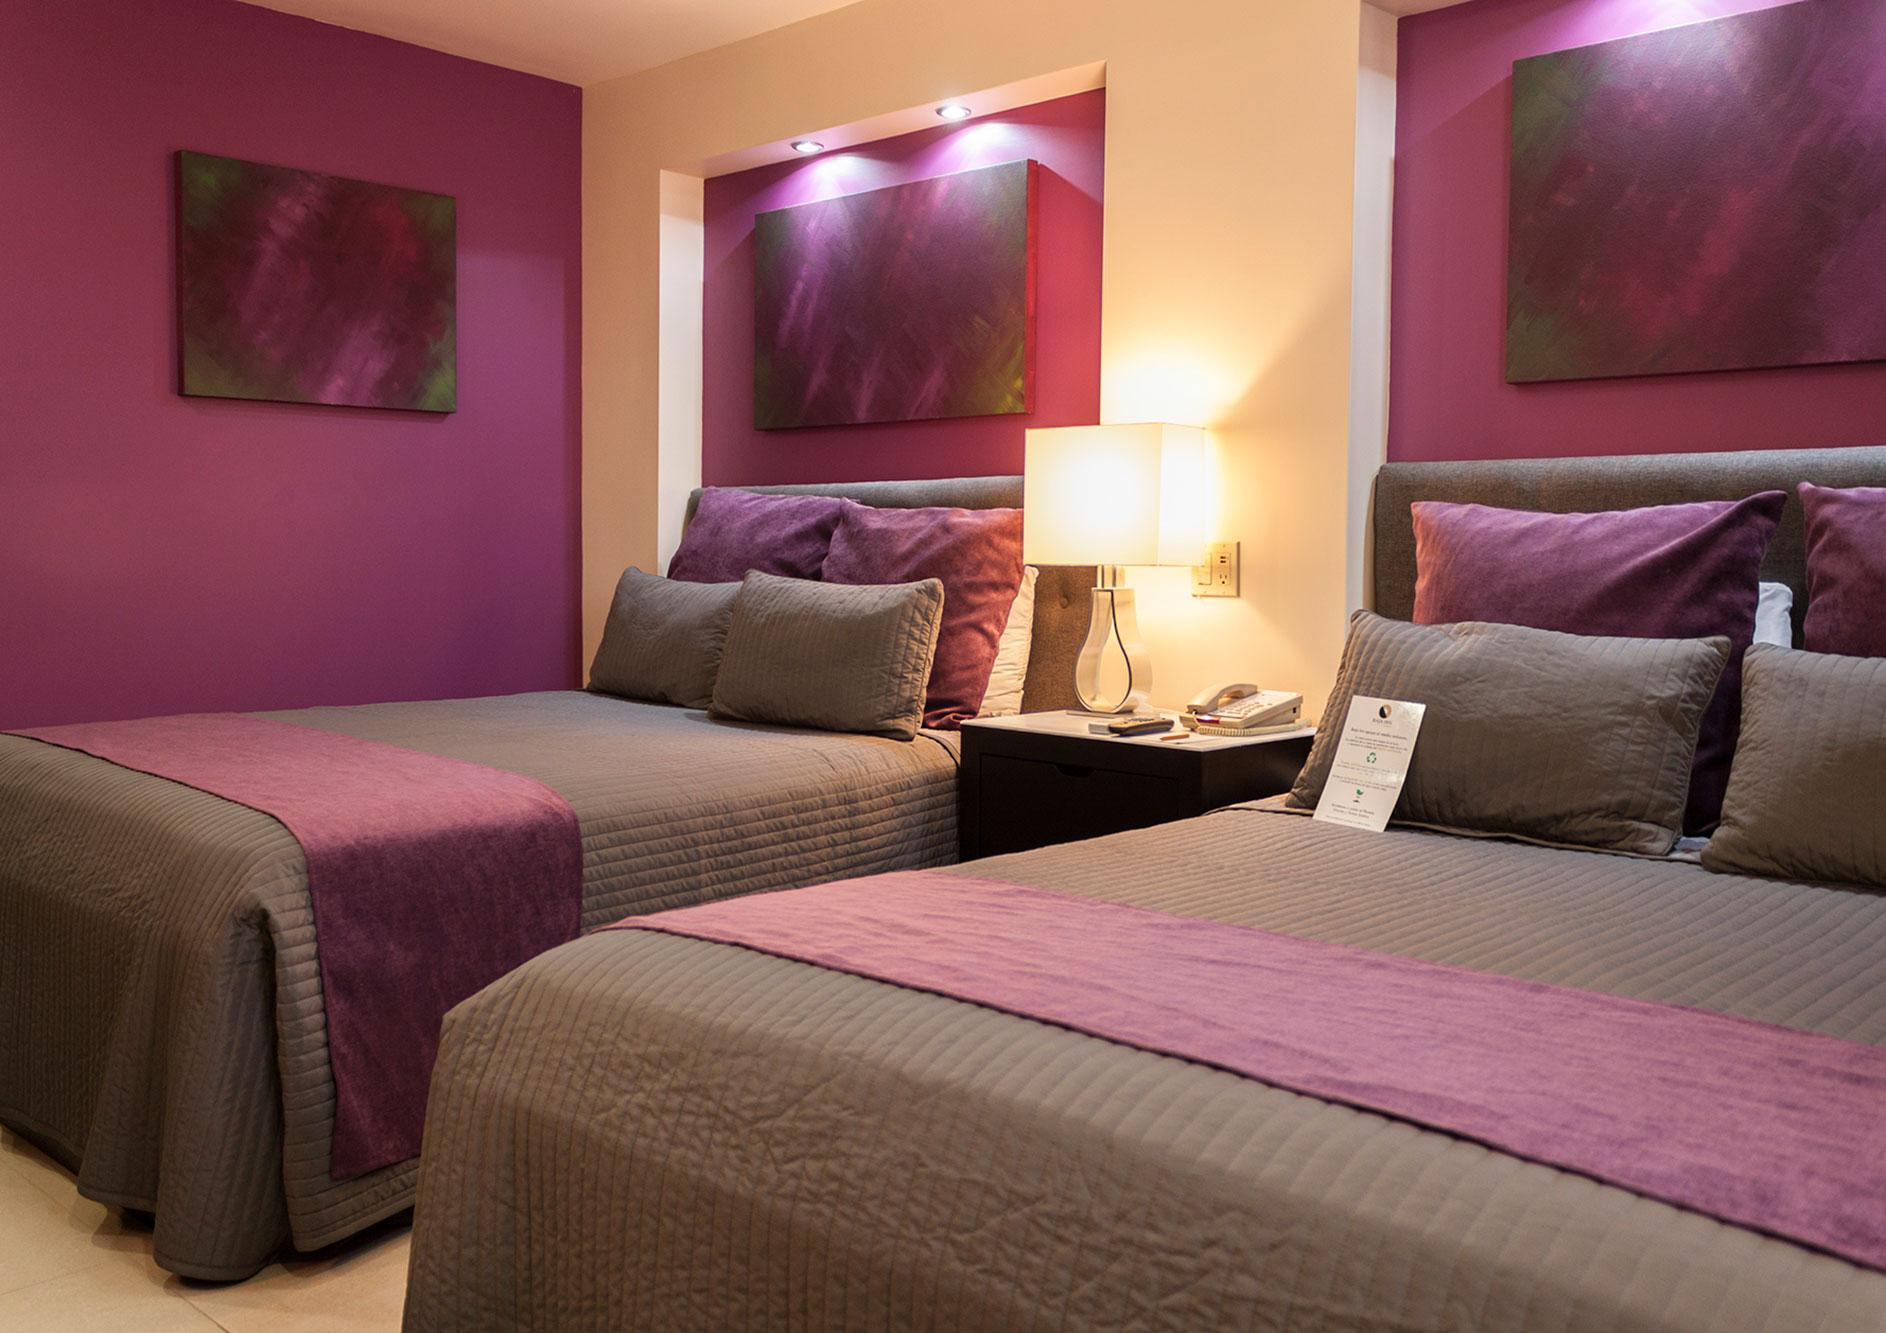 habitacion viñedo doble cama